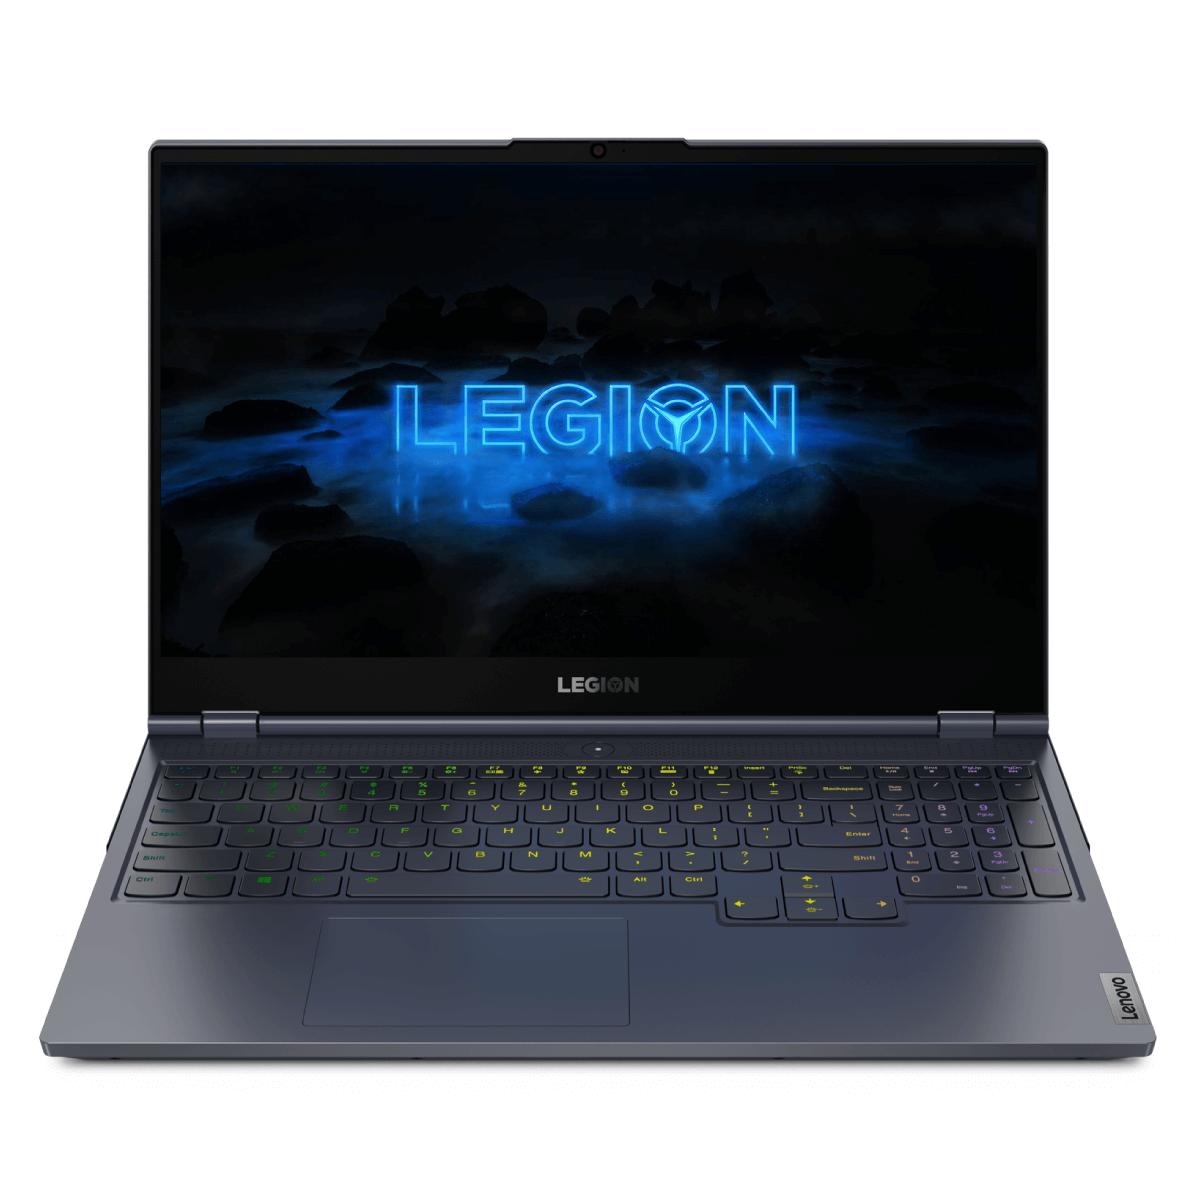 "Legion 7 (i7, 15.6"", Slate Grey)"